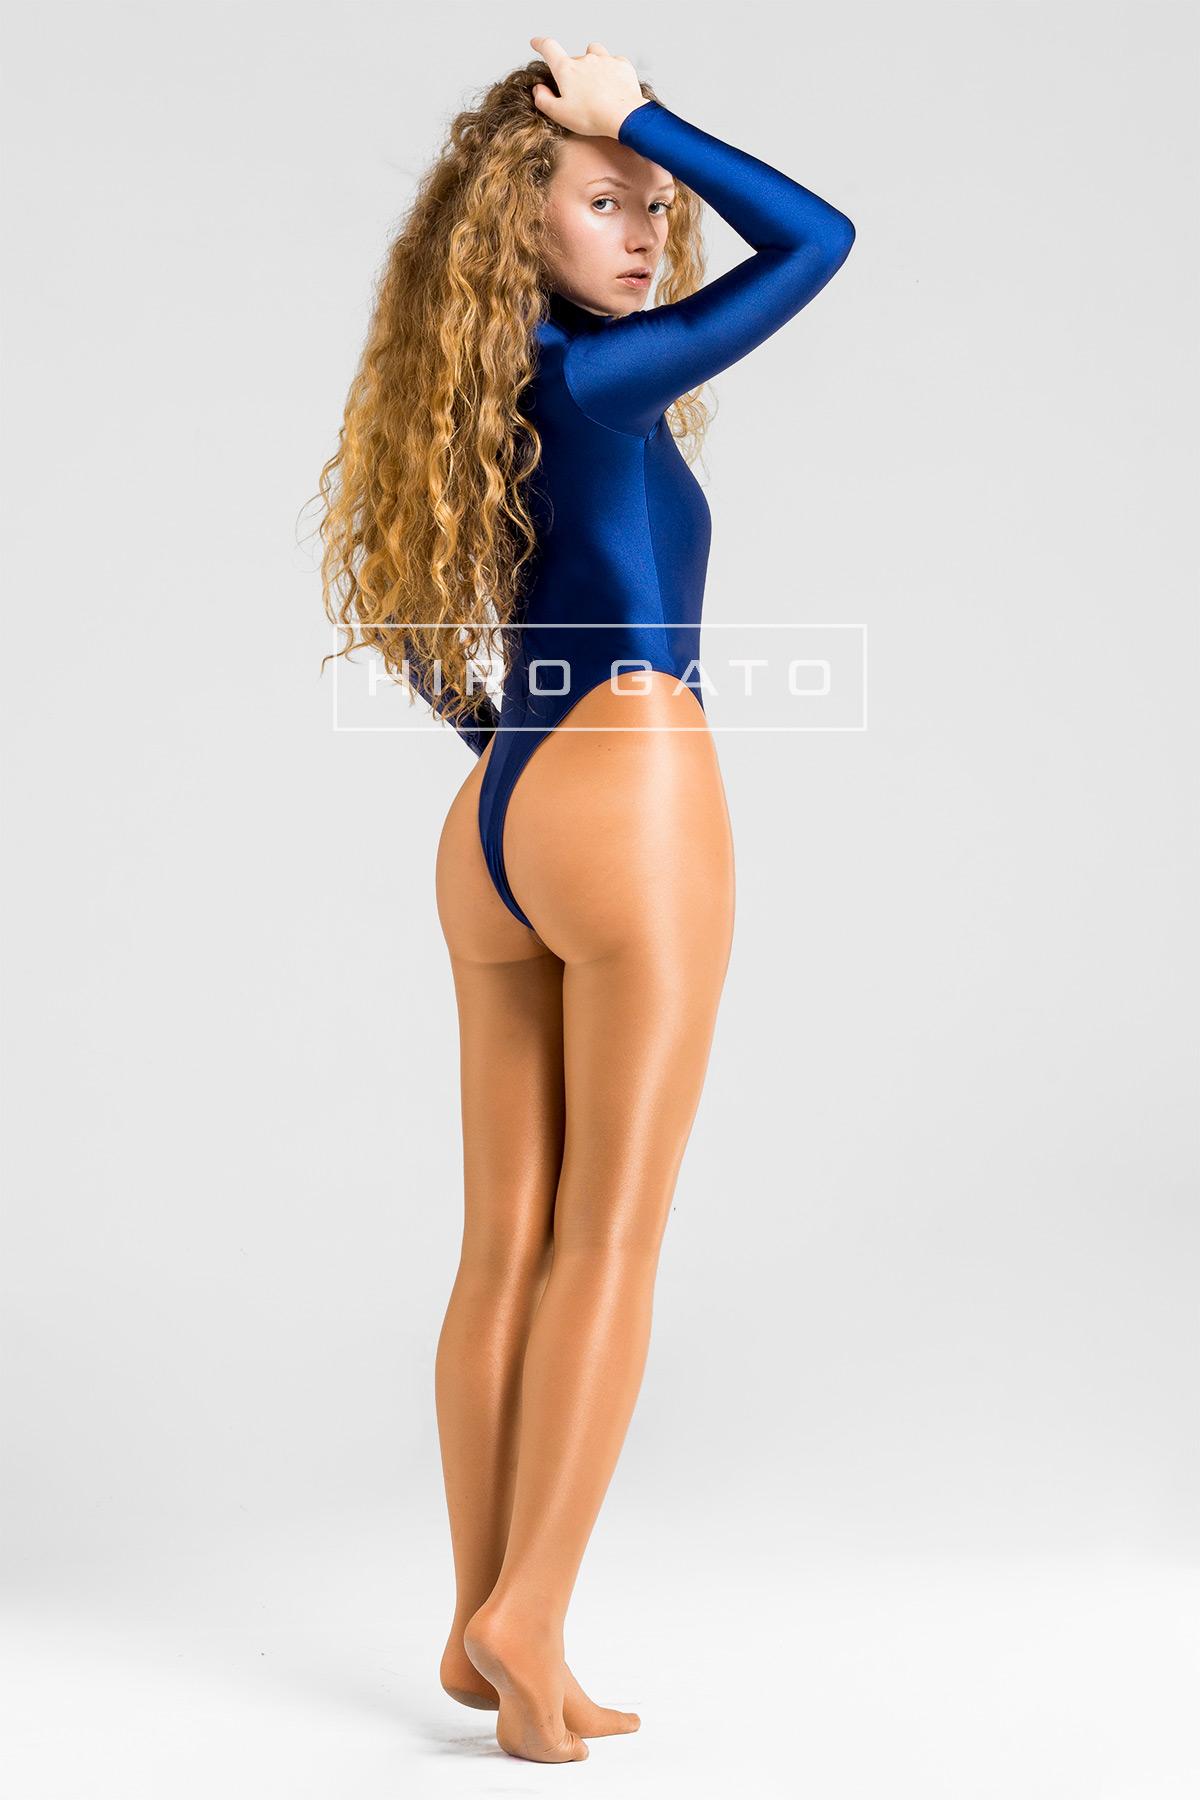 Lycra Gymnastikanzug Marineblau Hoch Geschnitten Shiny Spandex